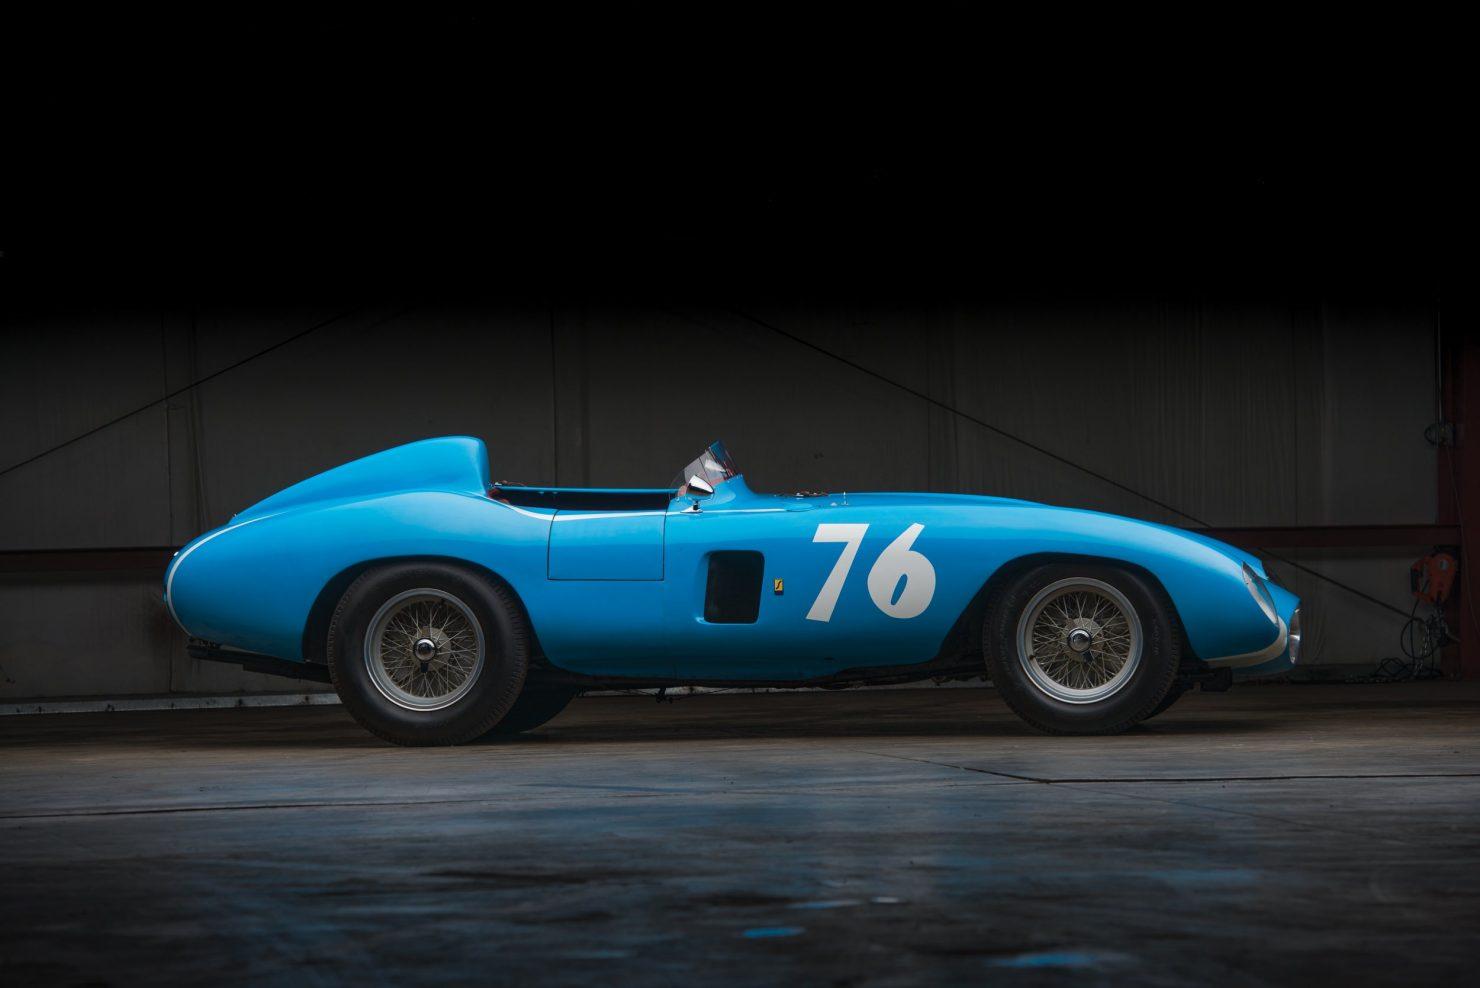 ferrari 121 lm spider 5 1480x988 - 1955 Ferrari 121 LM